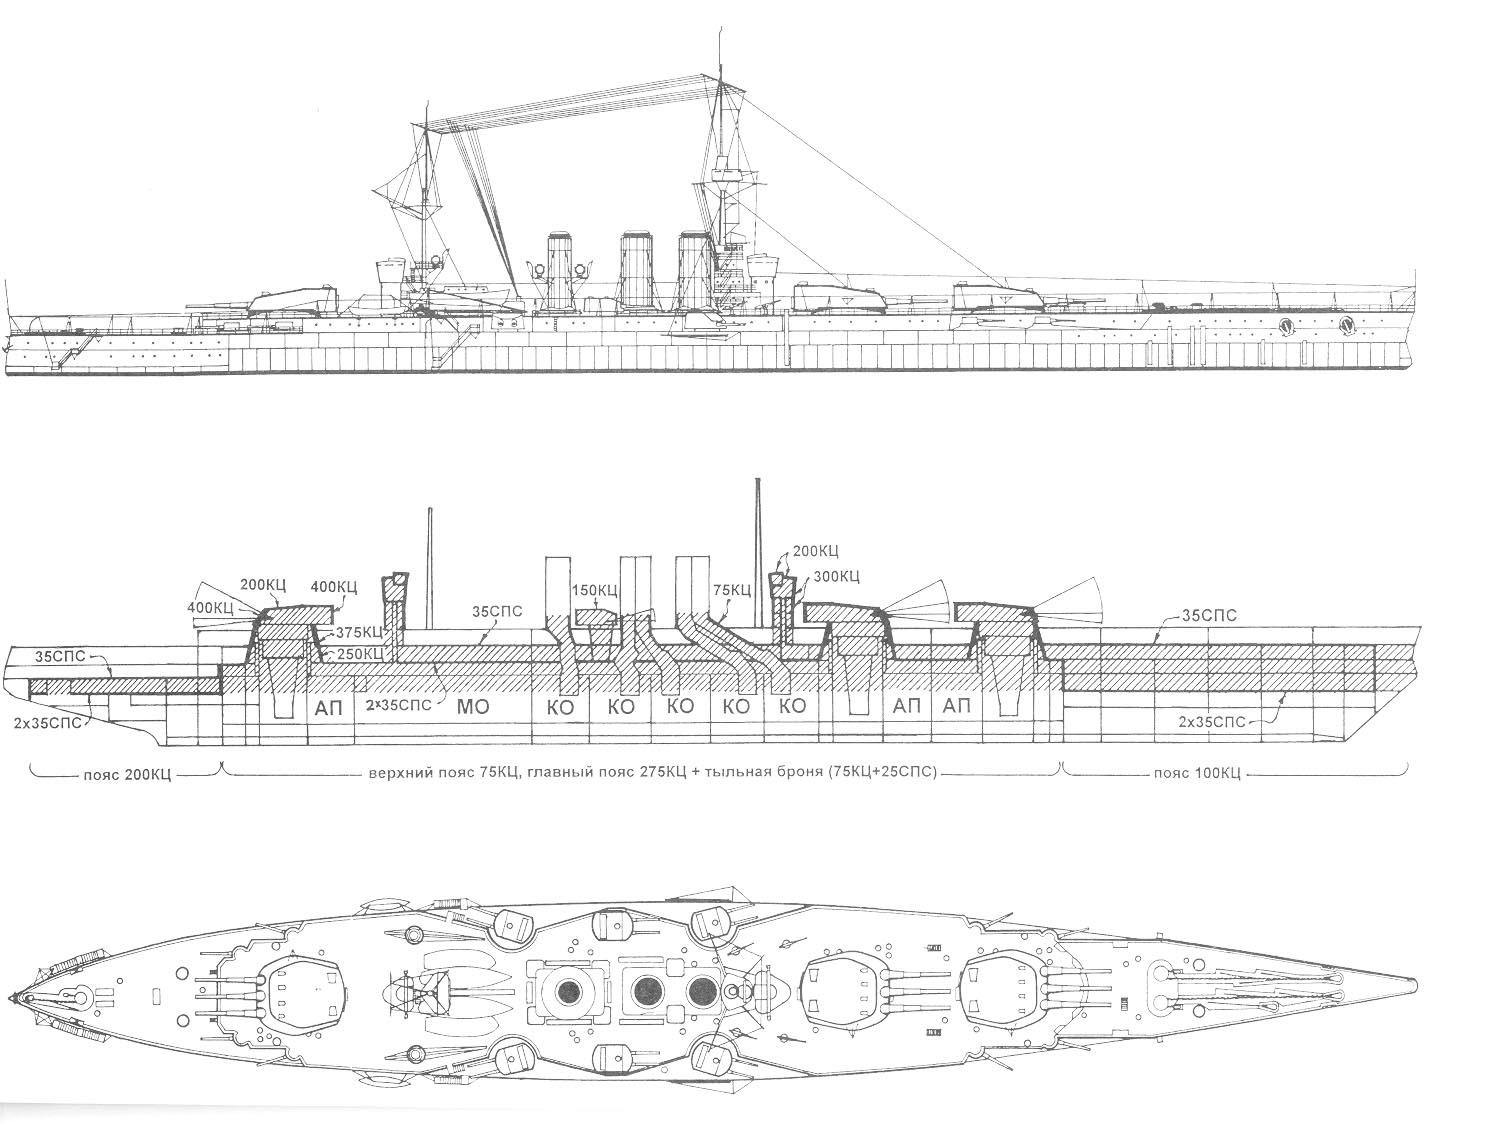 hight resolution of 1917 naval design for a black sea battleship